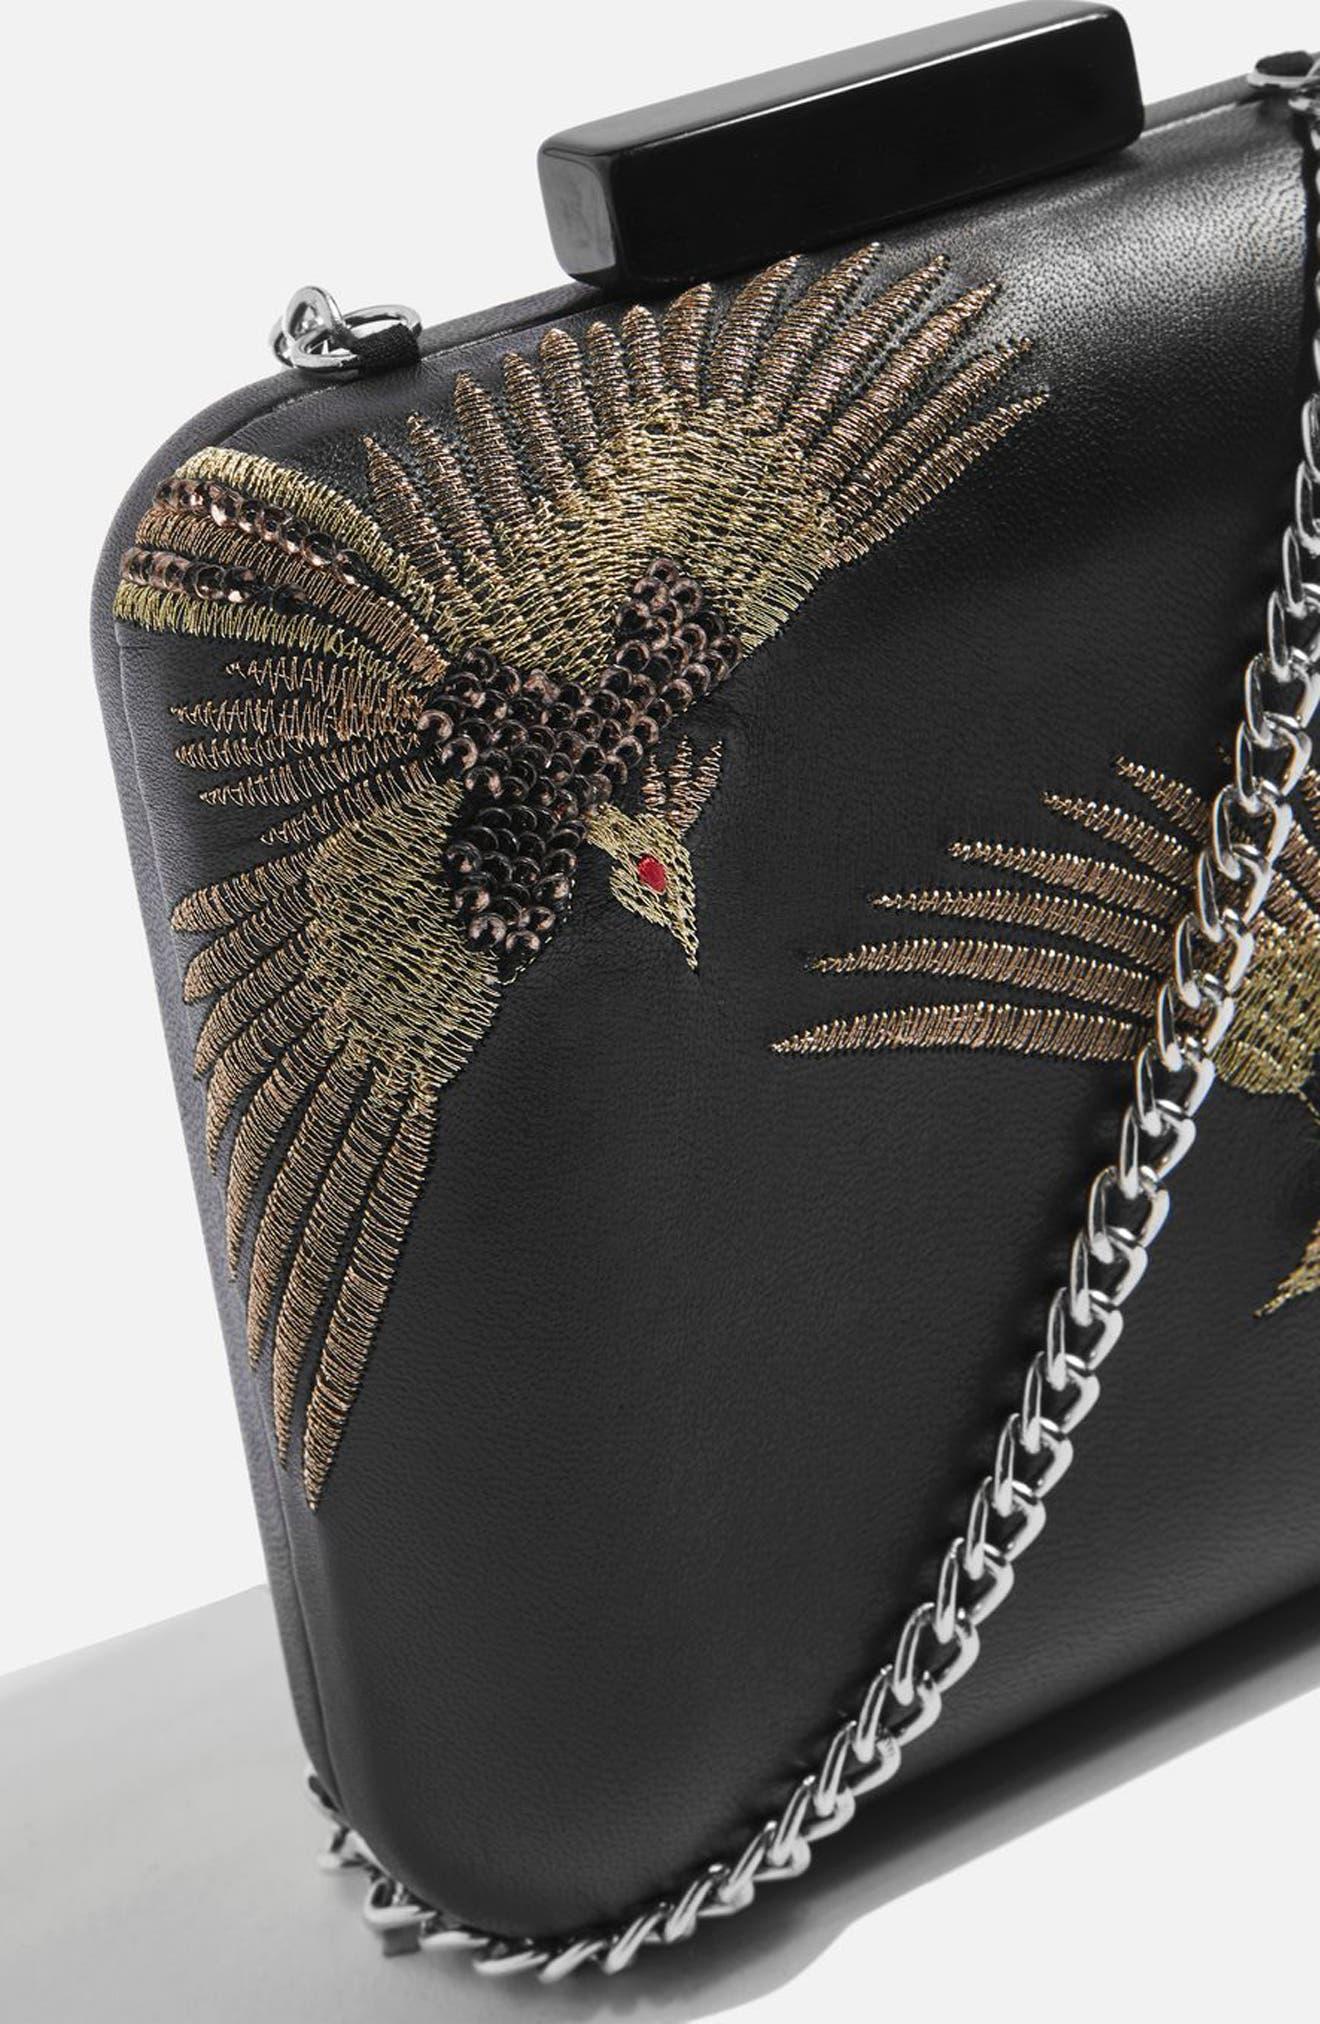 Embroidered Bird Boxy Leather Crossbody Bag,                             Alternate thumbnail 4, color,                             Black Multi